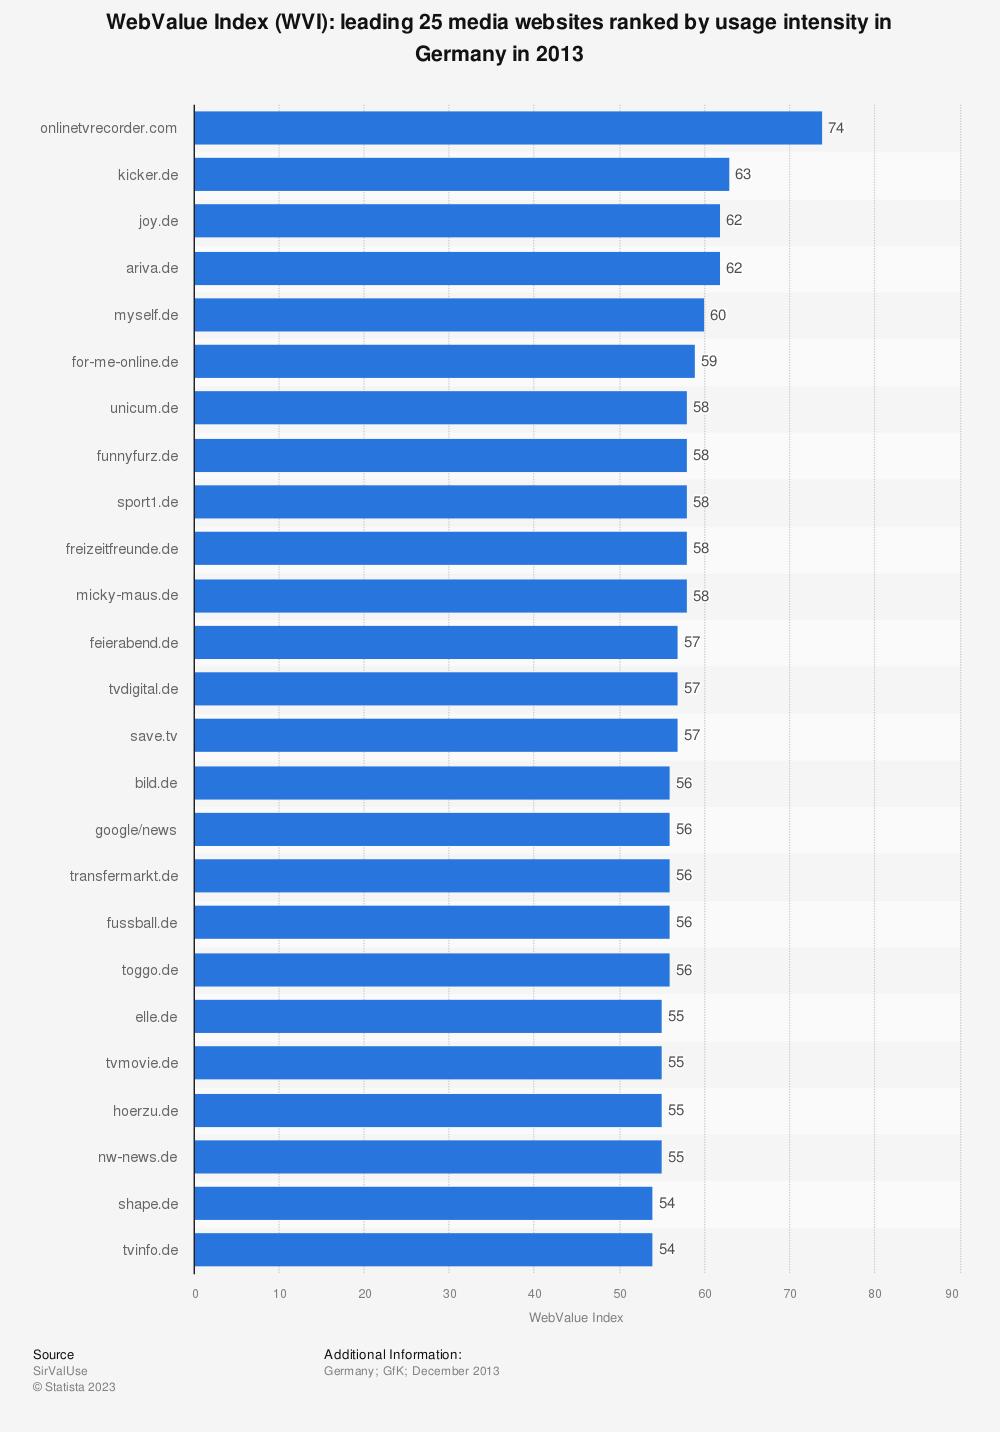 Statistic: WebValue Index (WVI): leading 25 media websites ranked by usage intensity in Germany in 2013 | Statista